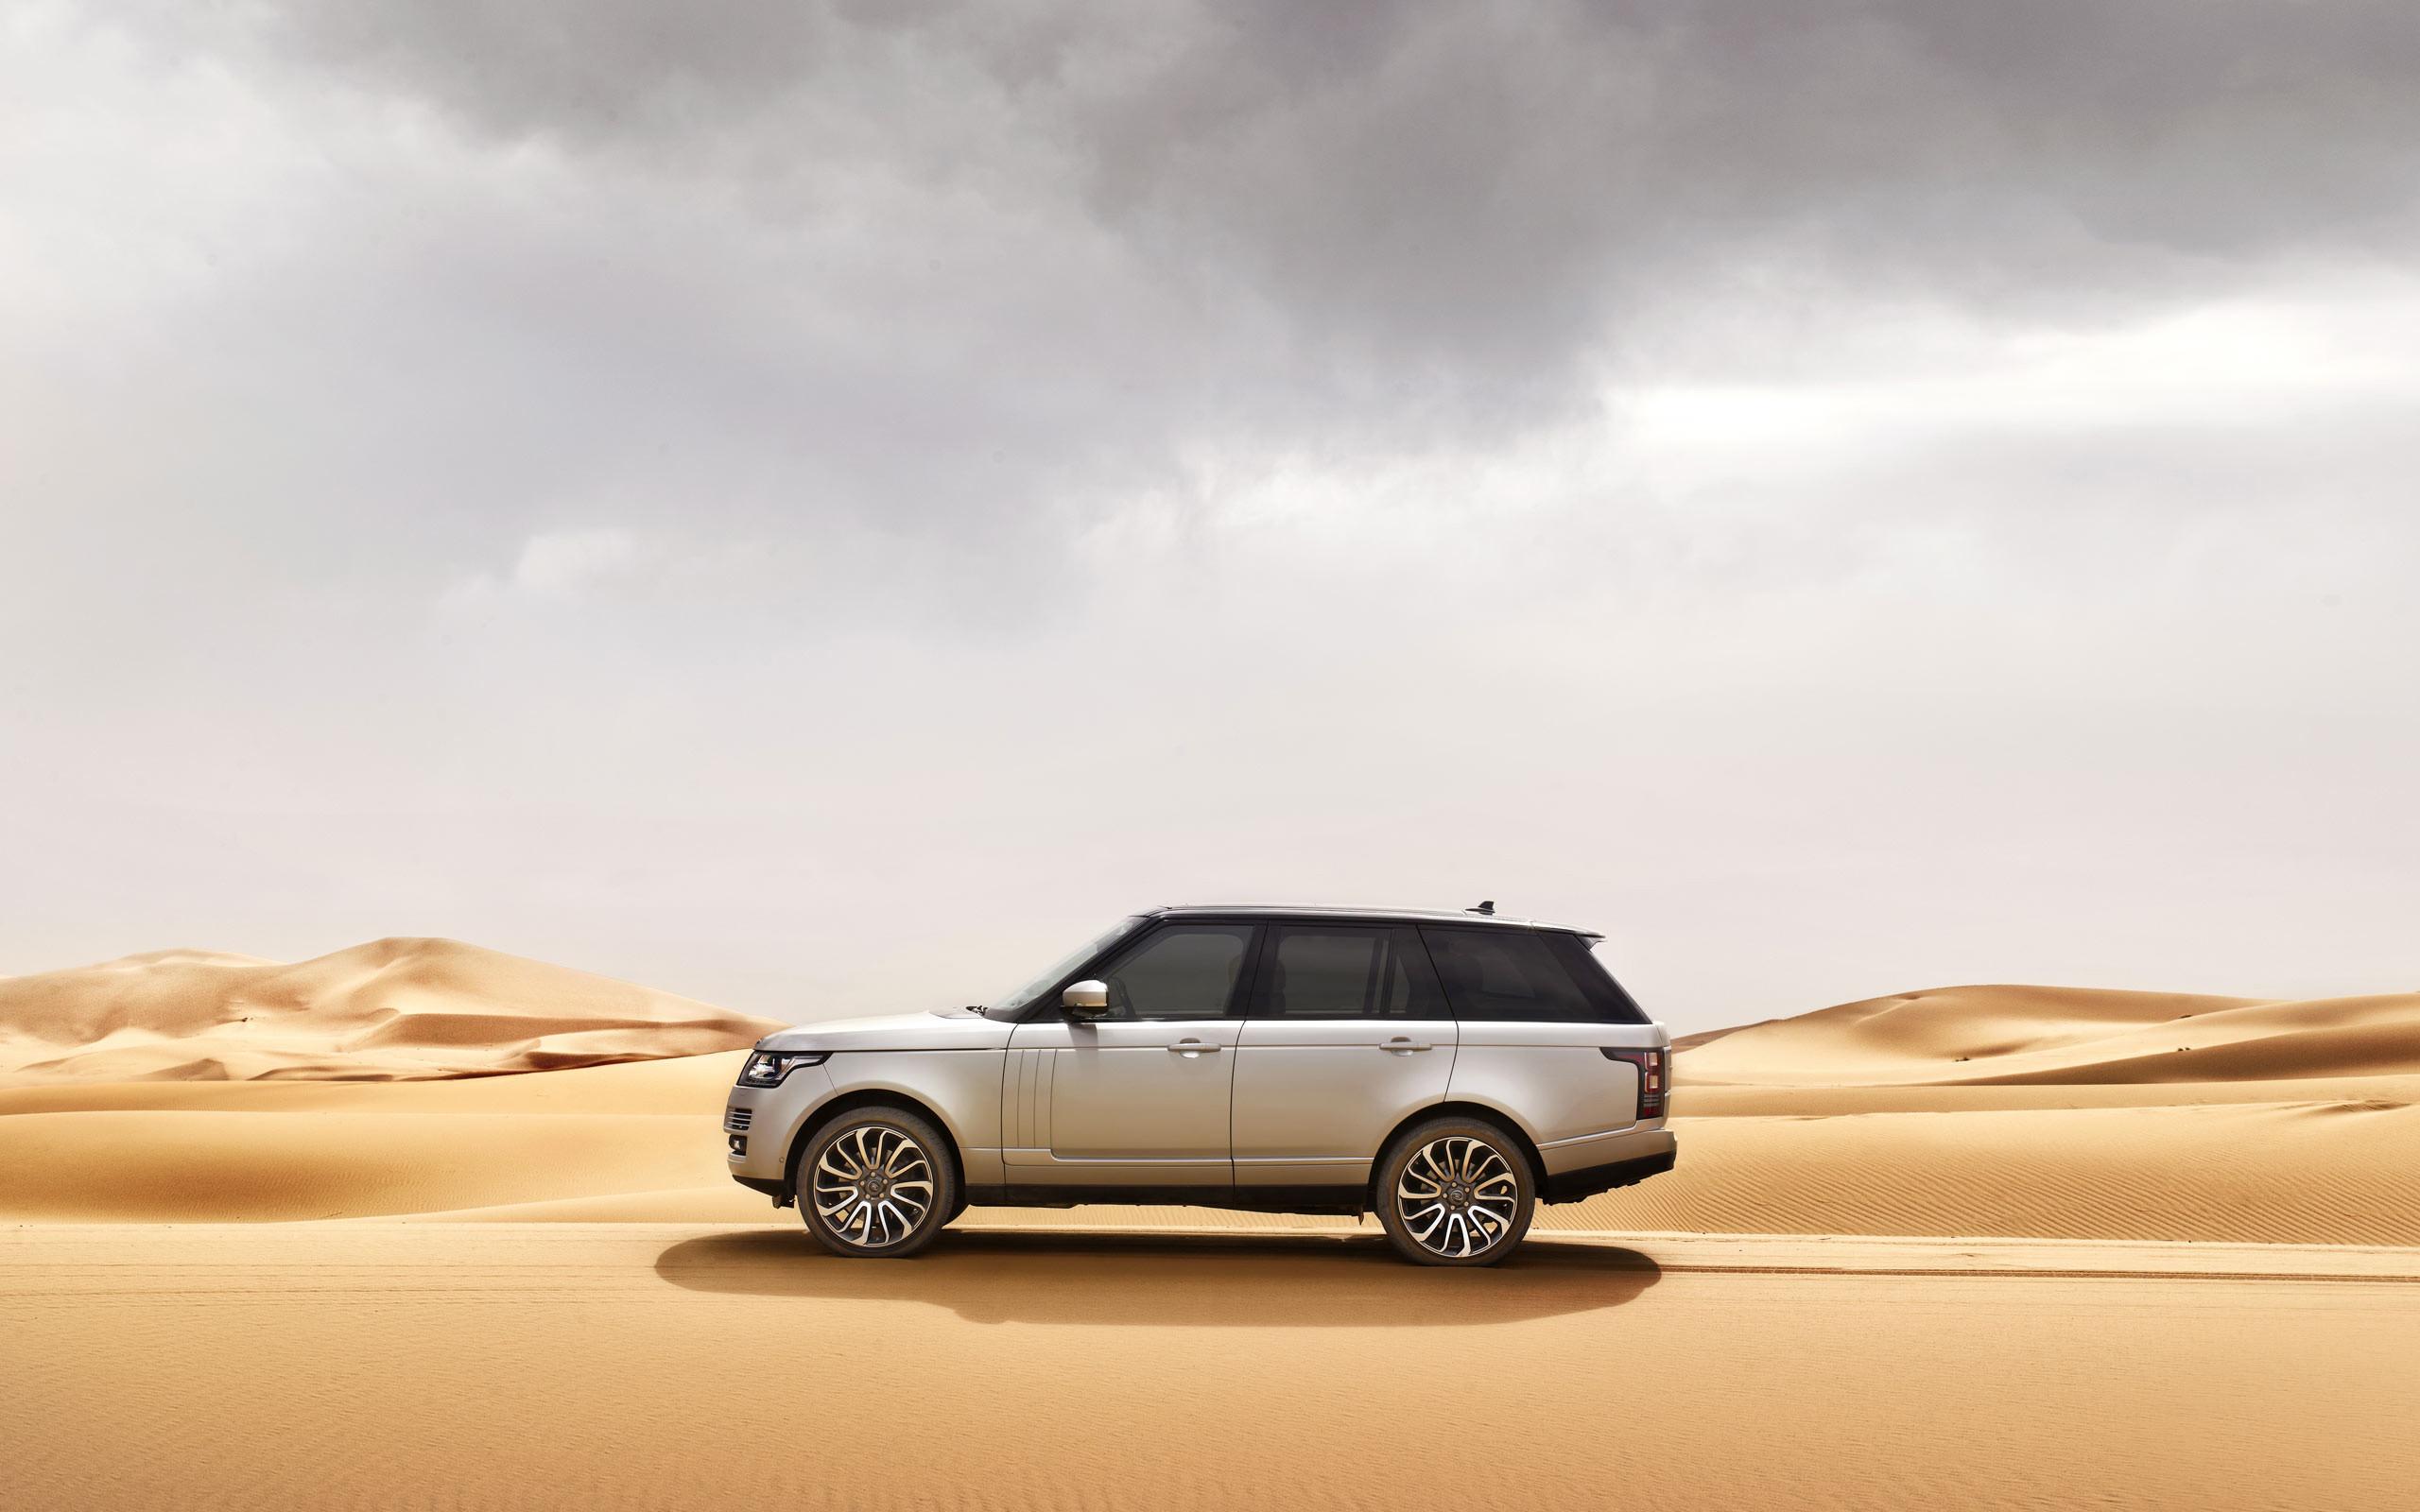 range rover wallpapers 4 .